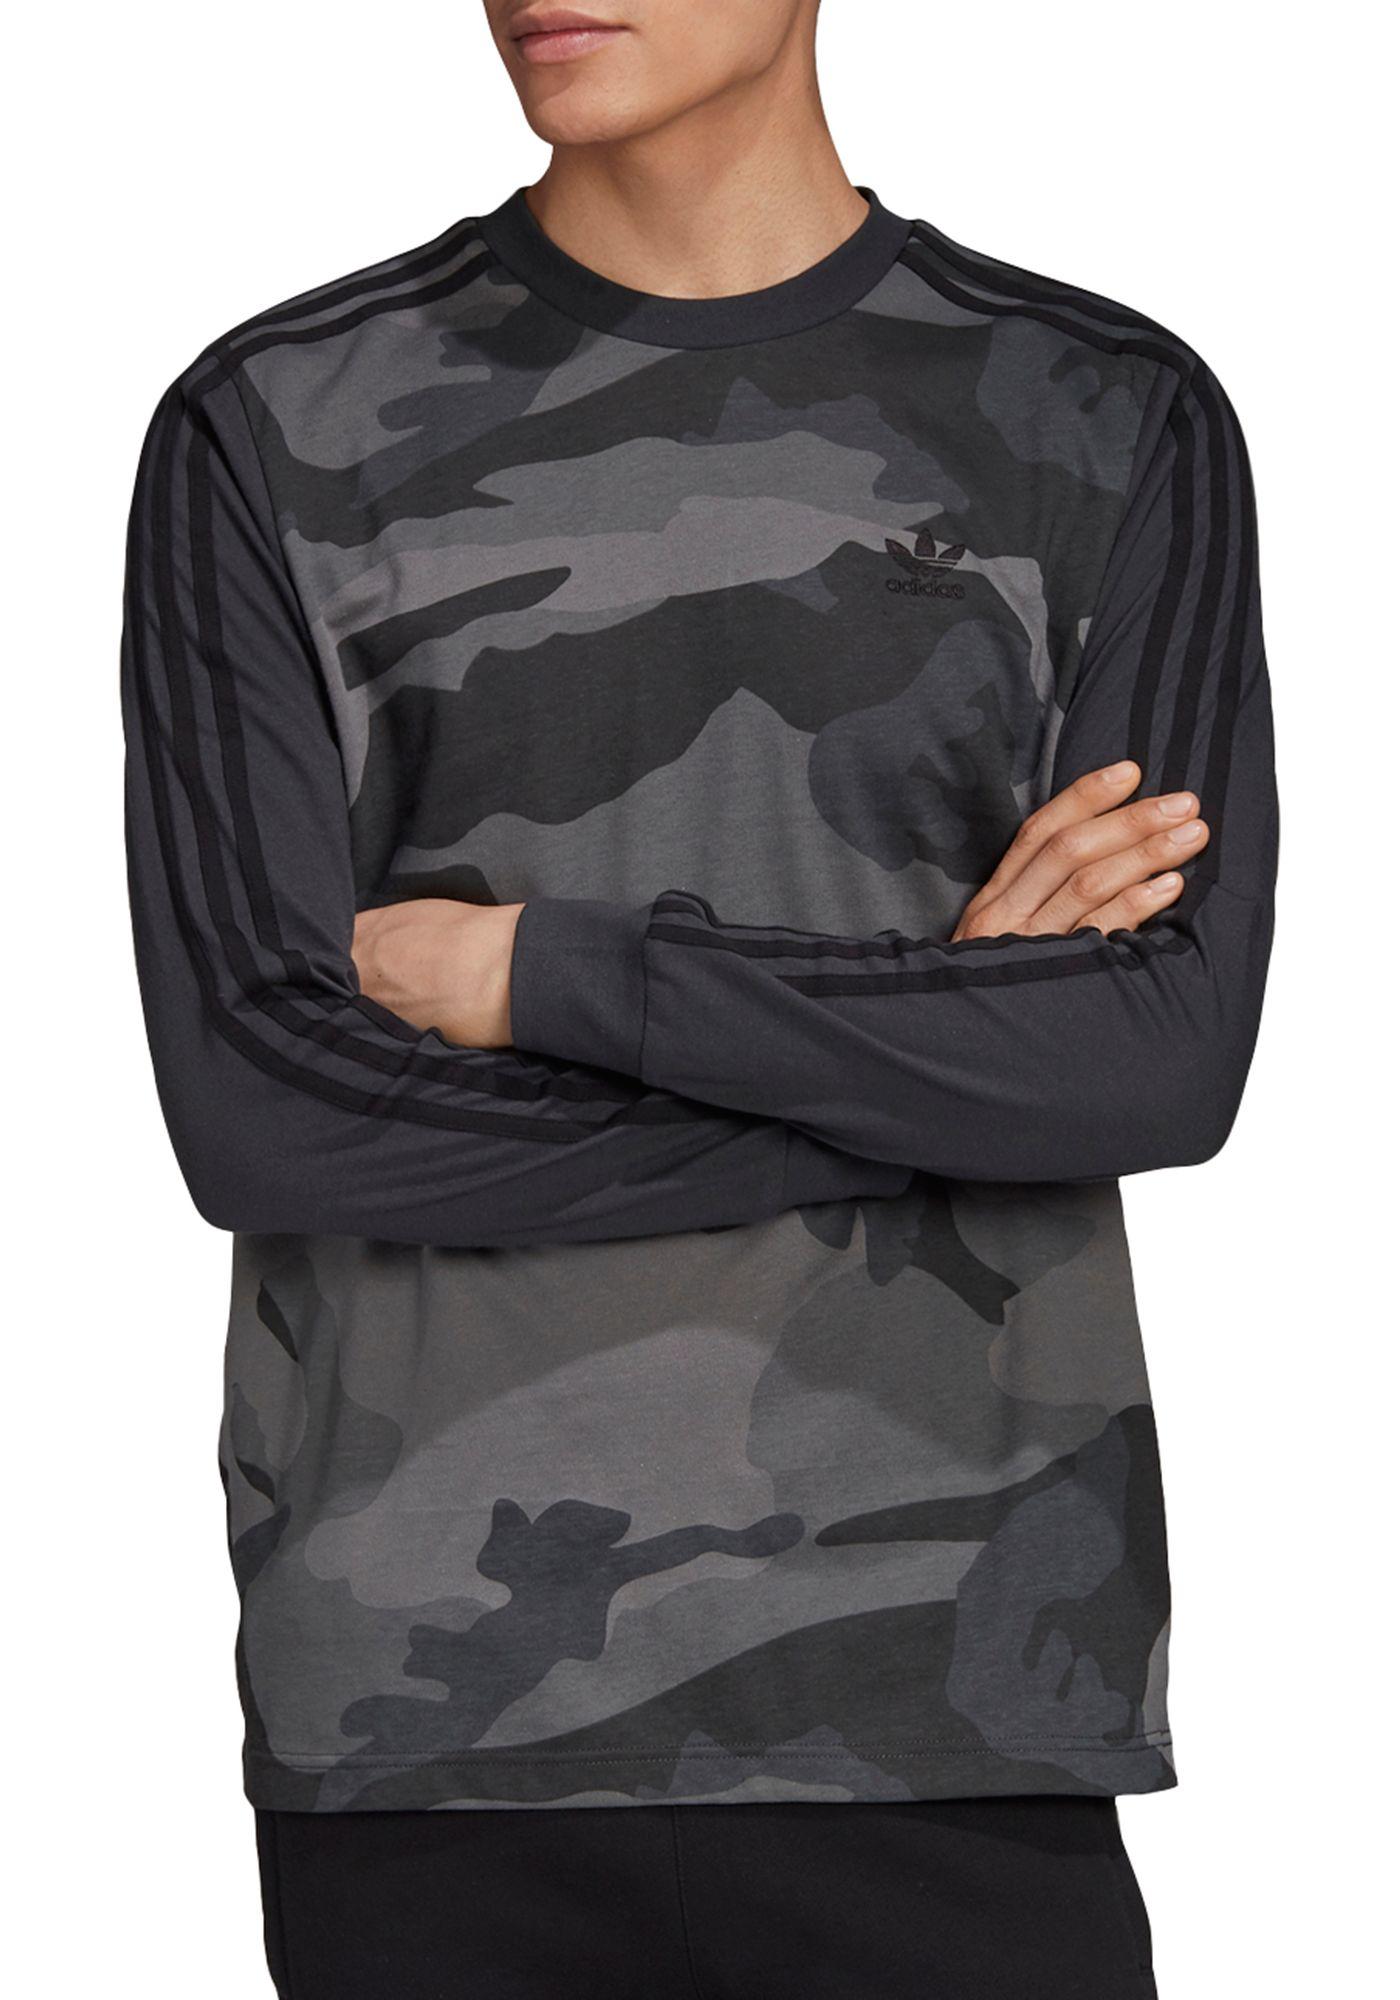 adidas Originals Men's Camouflage Long Sleeve Shirt